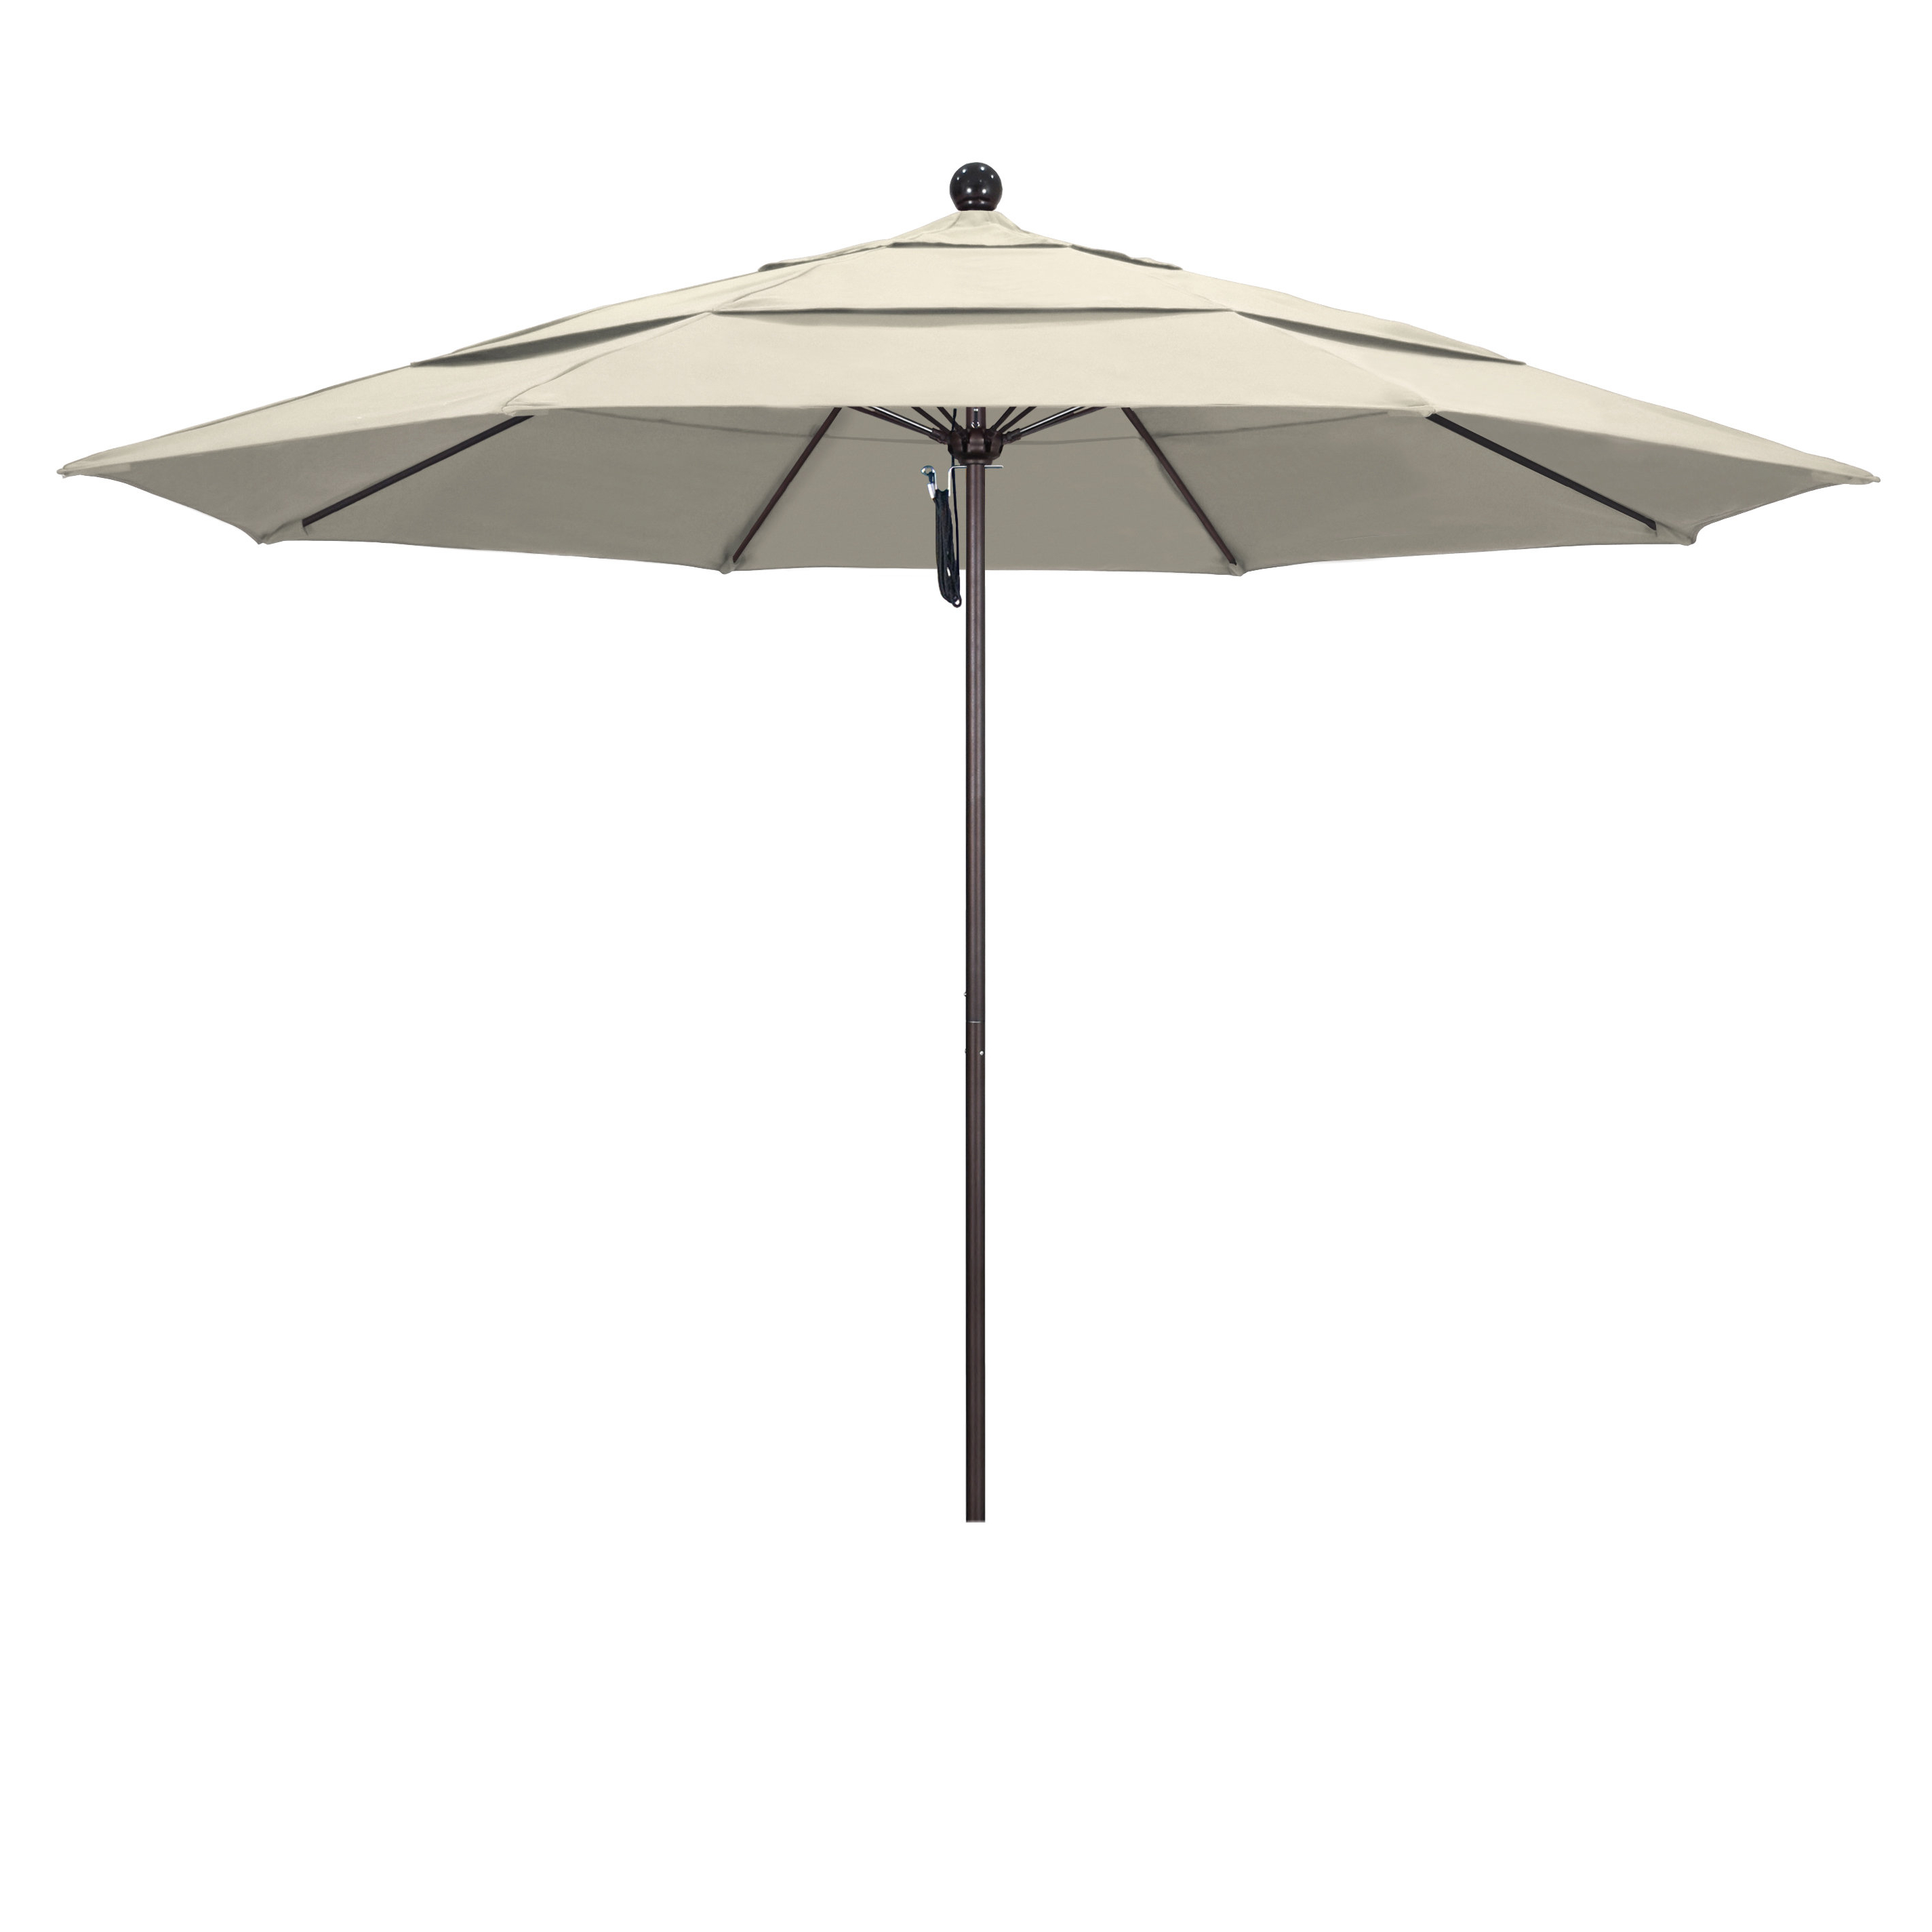 Mullaney Market Sunbrella Umbrellas Throughout Well Known Duxbury 11' Market Umbrella (View 20 of 20)